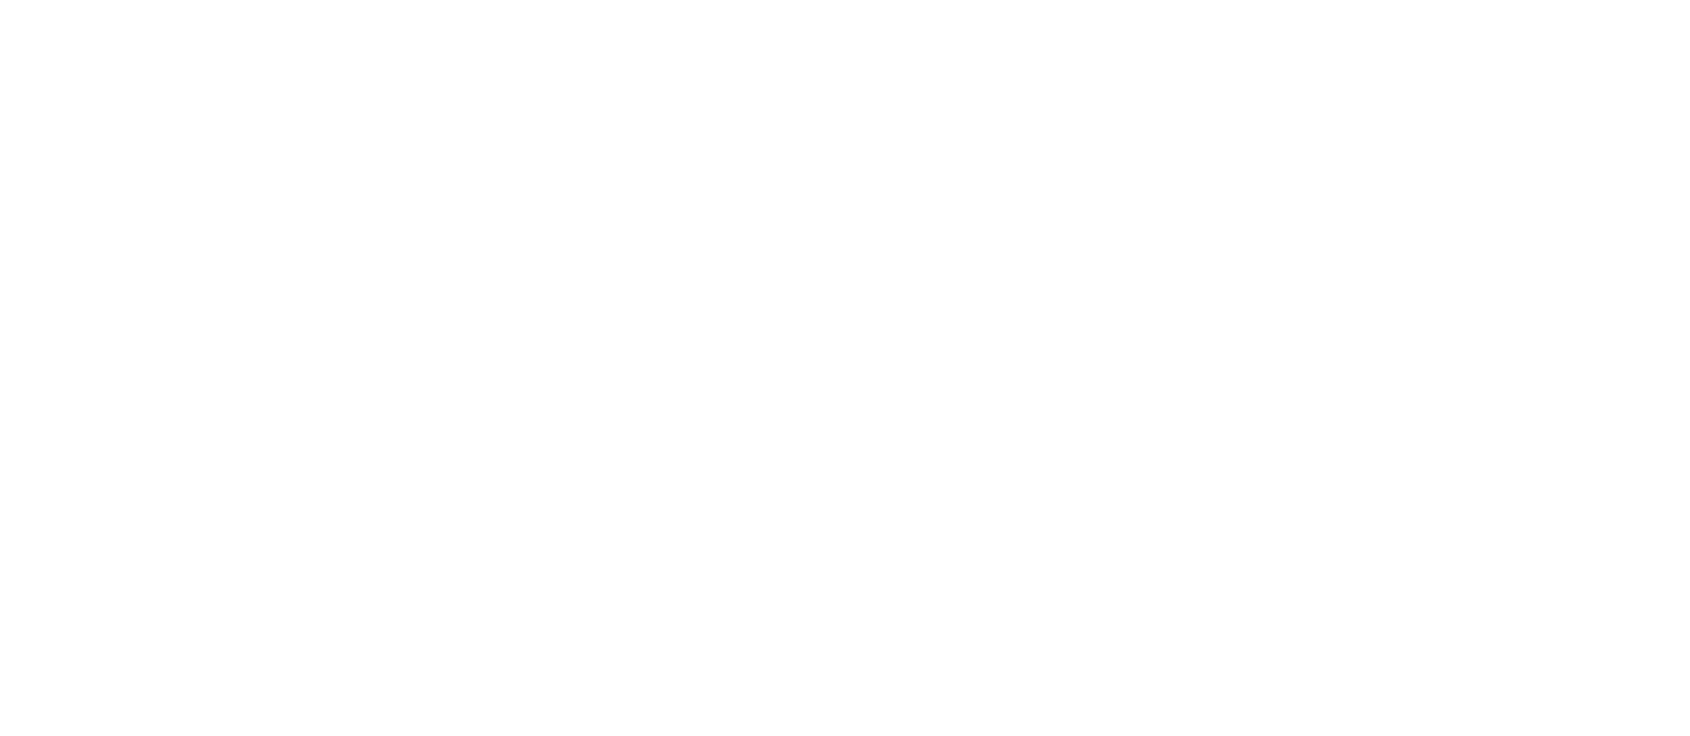 cruzer-white.png